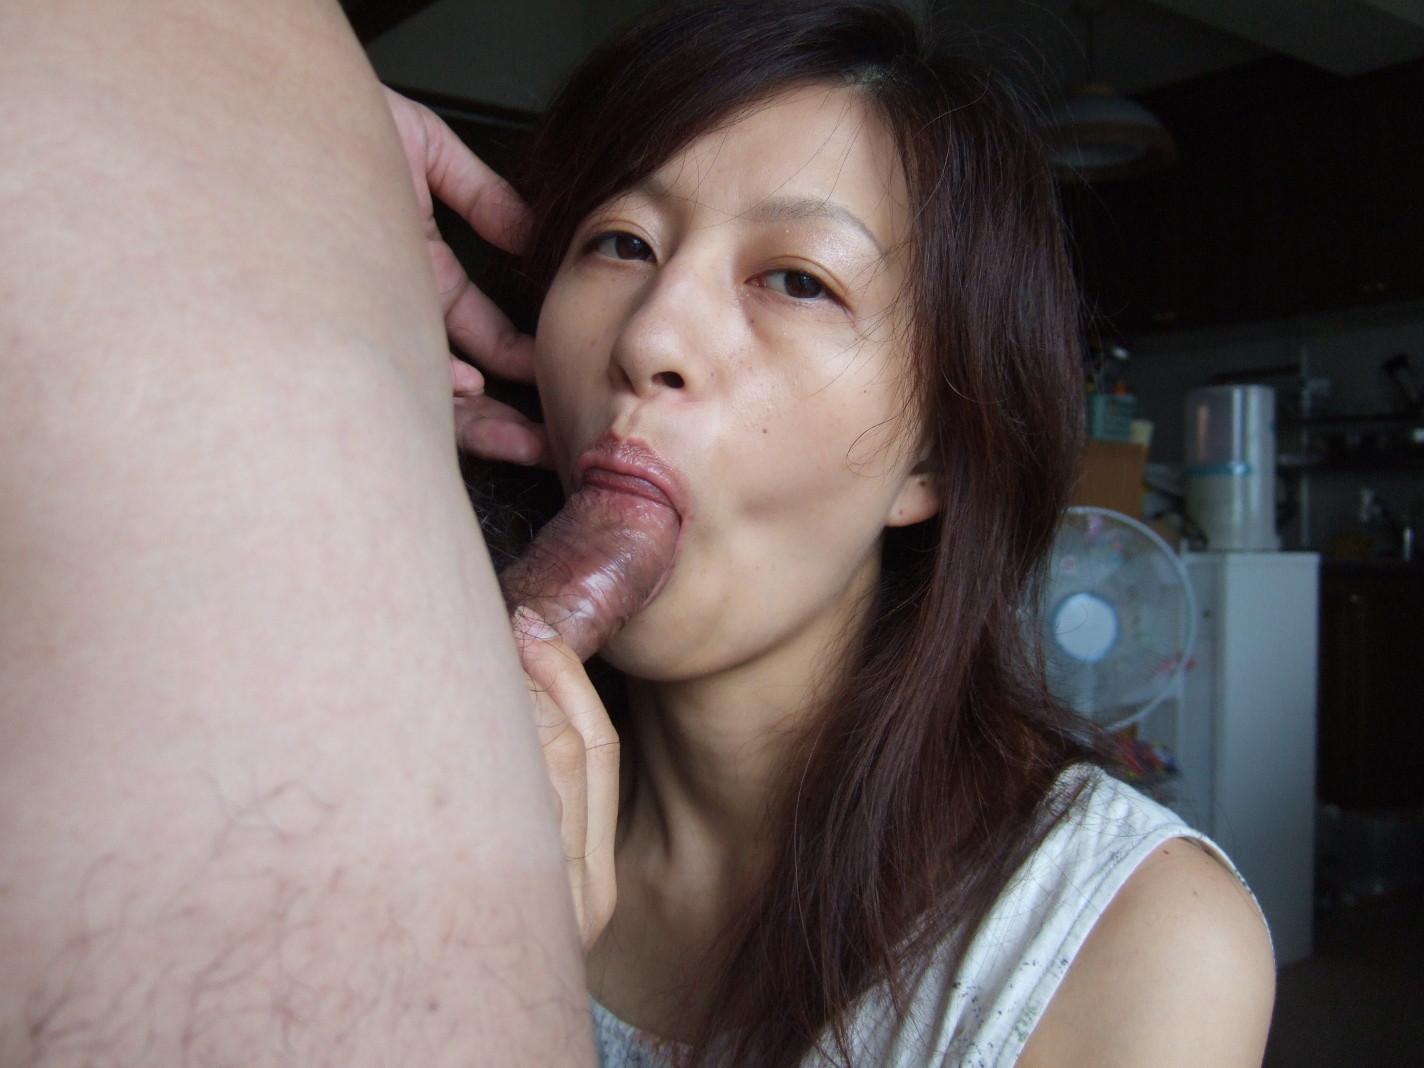 Chinese woman fucking white man